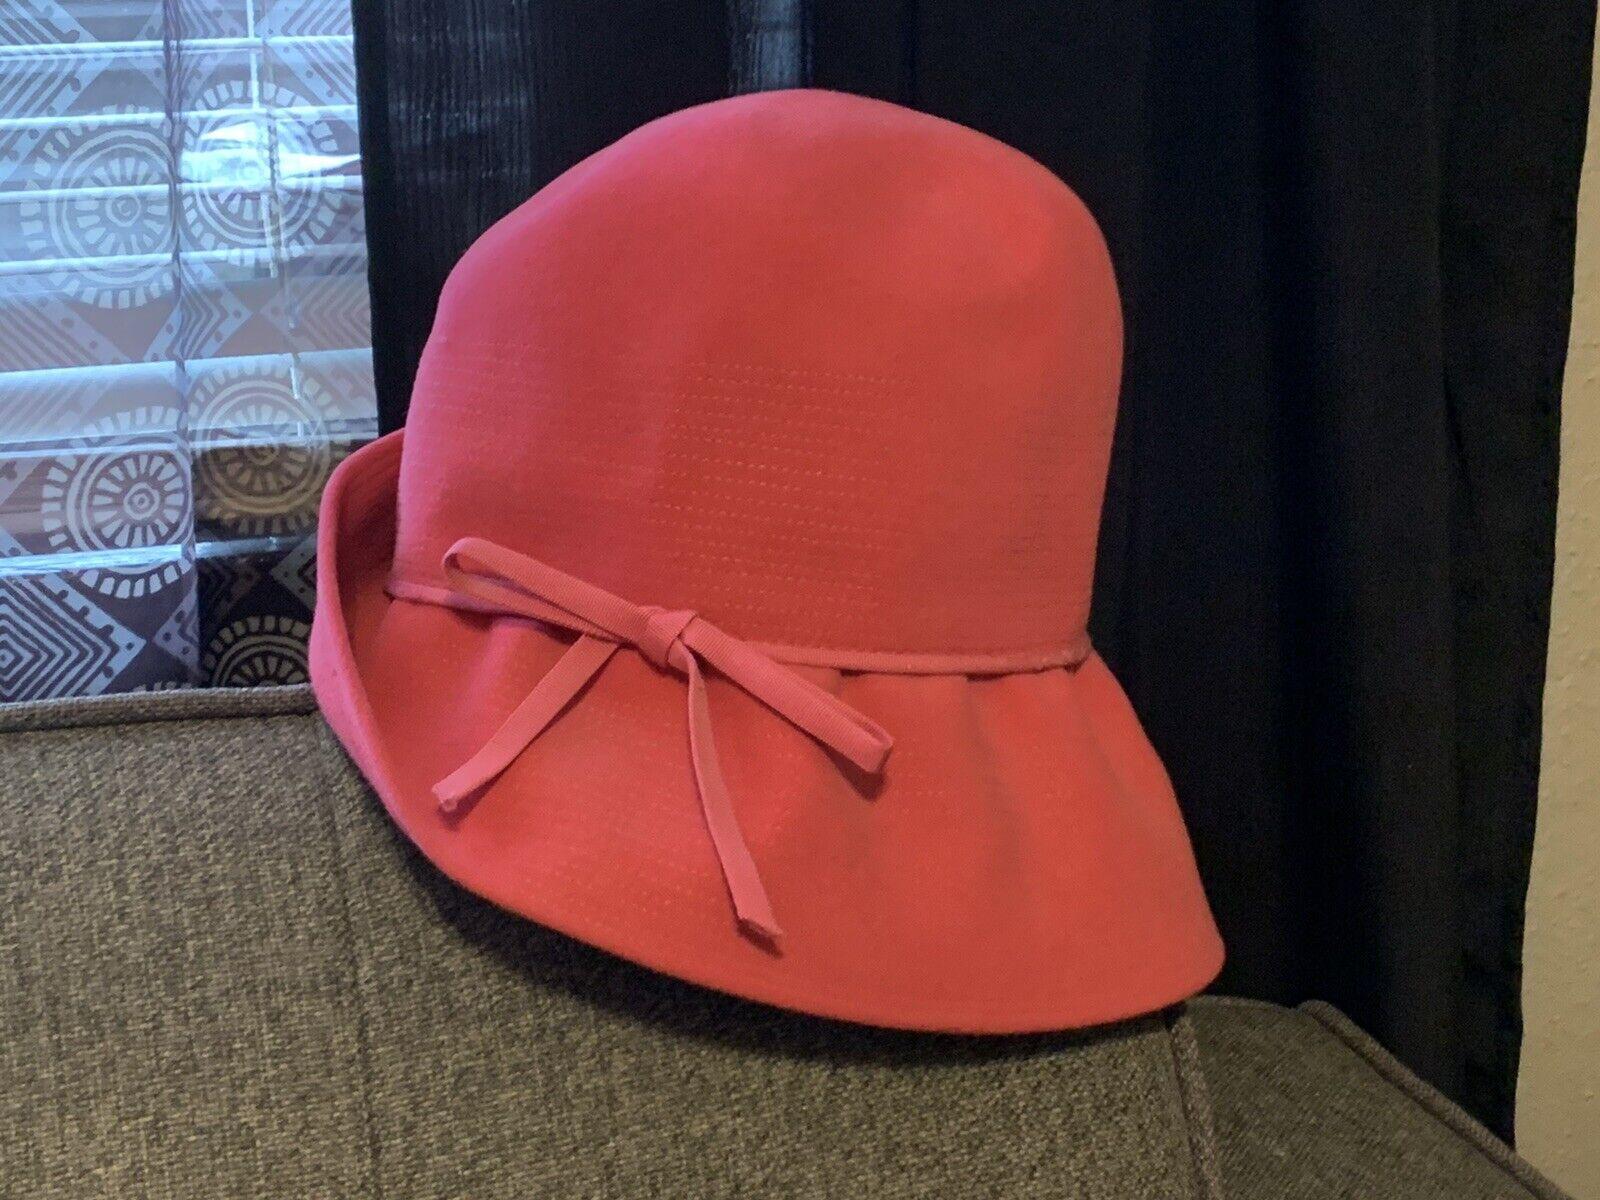 CHRISTIAN DIOR VINTAGE PINK BUCKET STYLE HAT - image 3